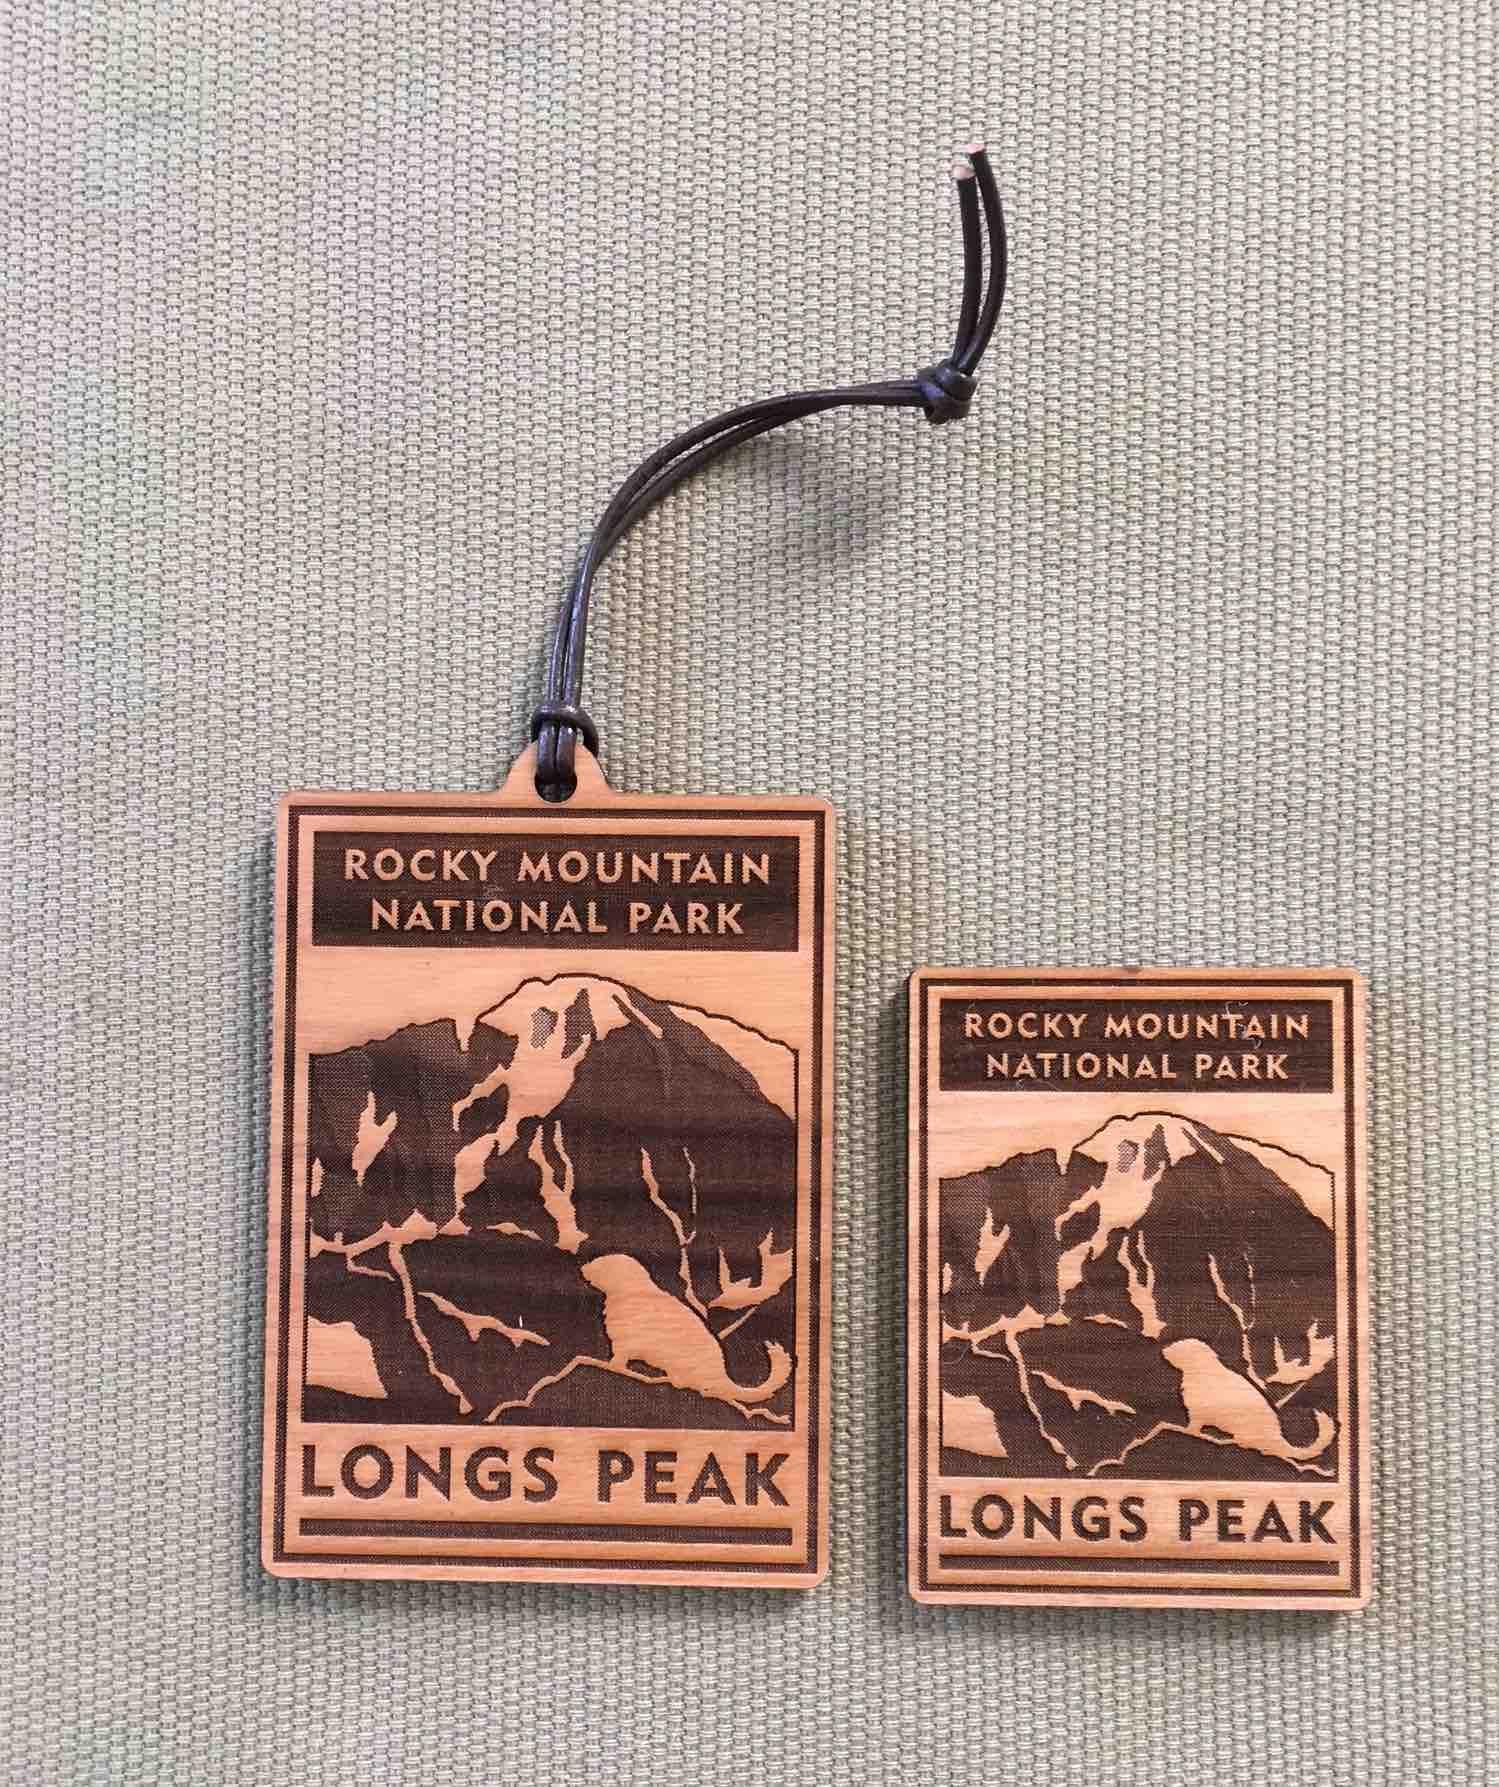 Longs Peak Scenic Icon - Ornament & Magnet